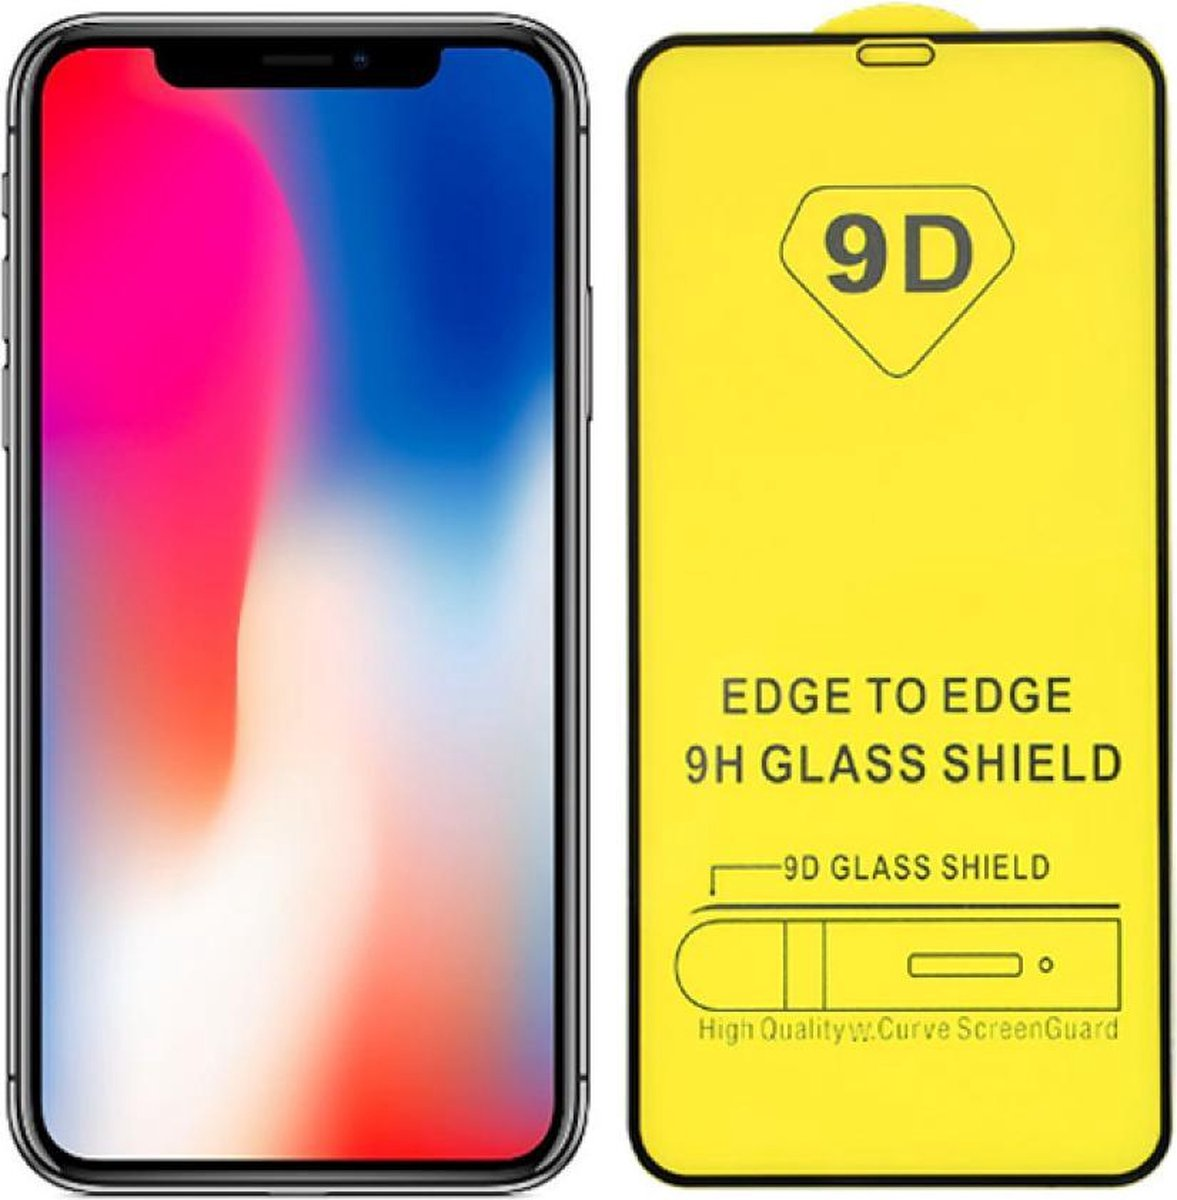 screenprotector beschermings glas Full Cover 9D Extra Sterk voor Apple iPhone X/XS iPhone 11 Pro Screenprotector Beschermglas Glazen bescherming voor iPhone X/XS/11pro